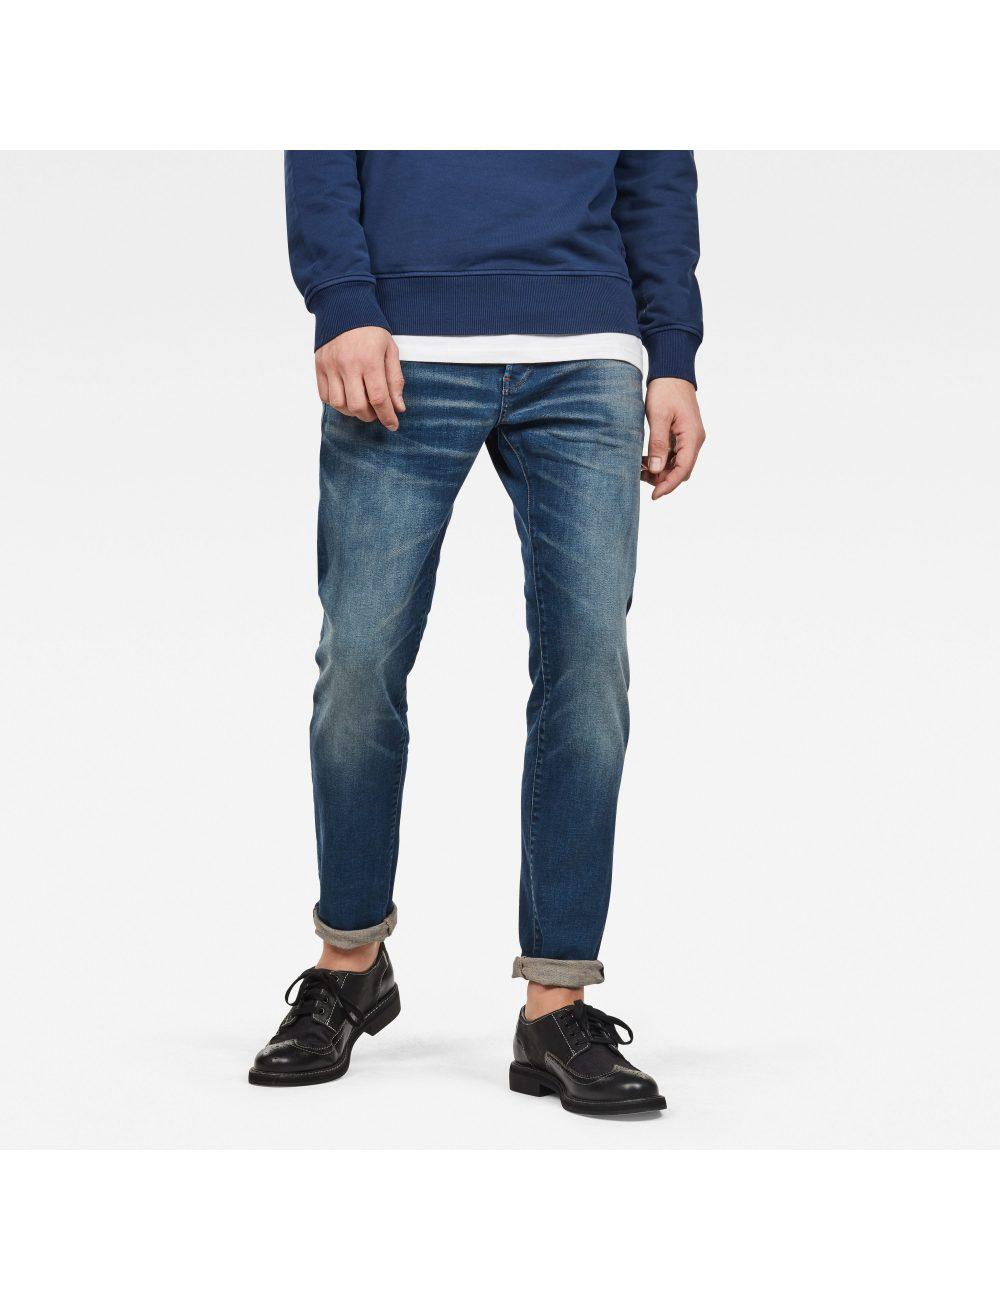 Jean 3301 Slim blue faded